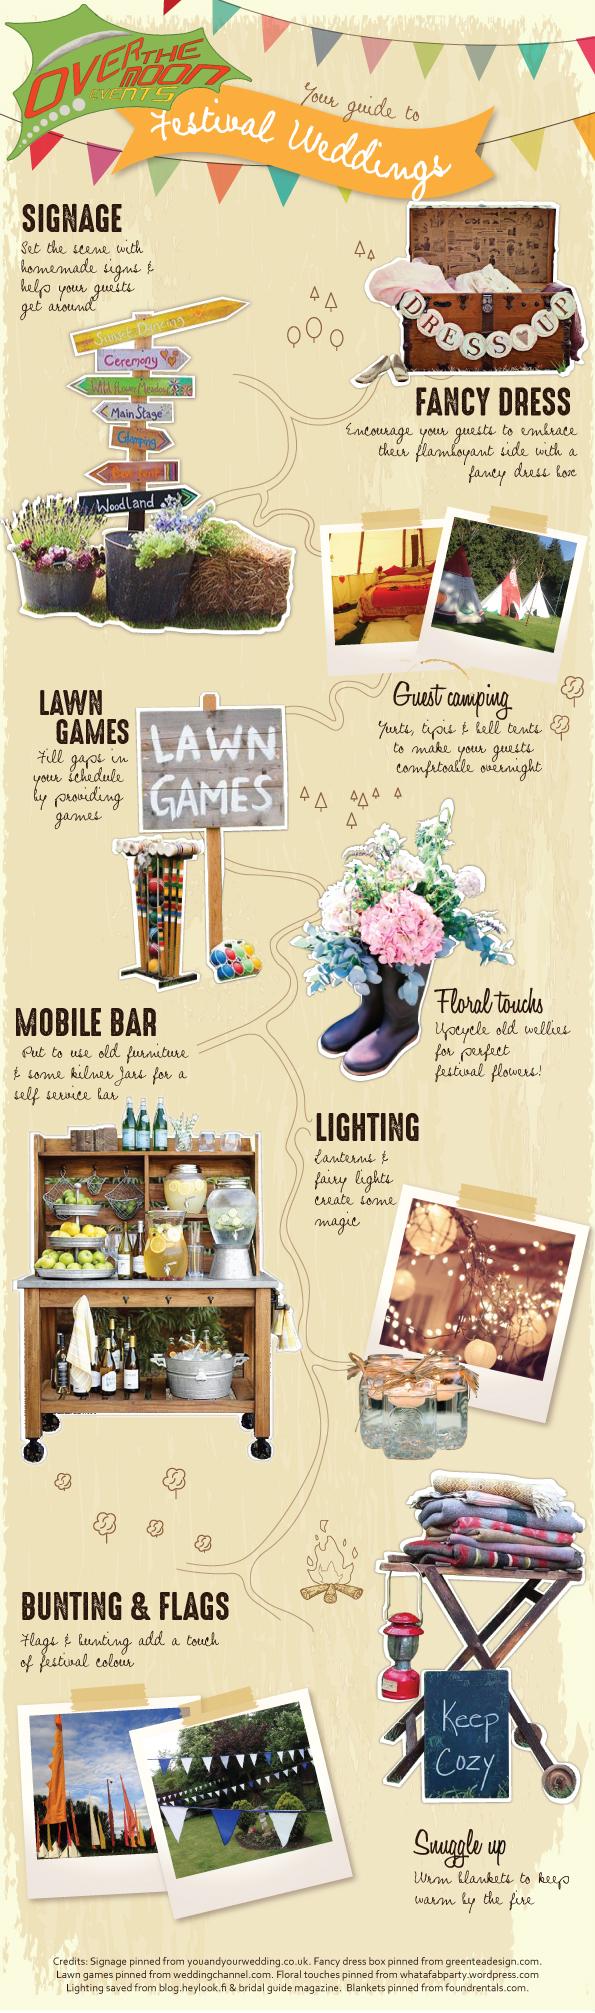 Guide To Festival Weddings